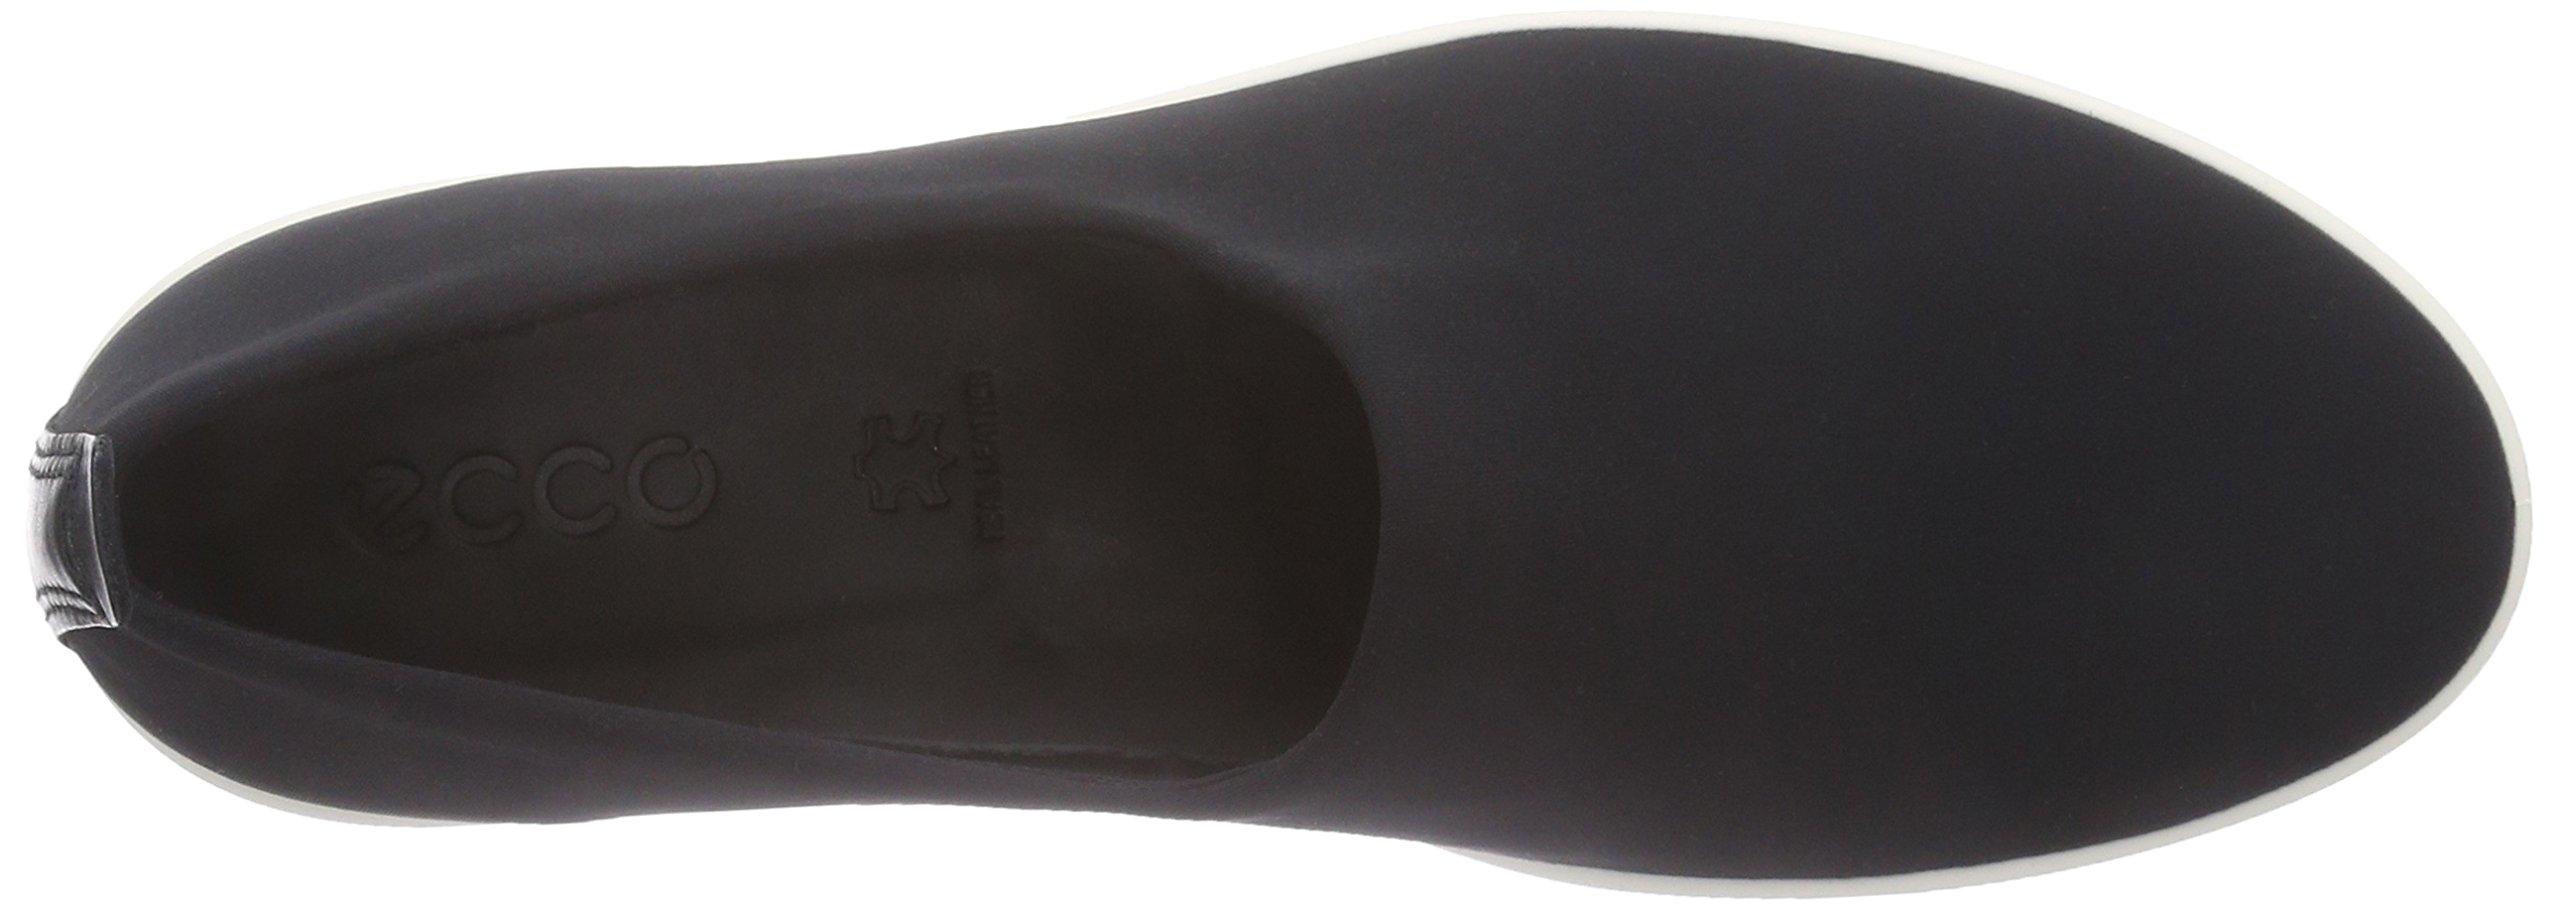 Ecco Footwear Womens Fara Slip-On Loafer, Black/Black, 42 EU/11-11.5 M US by ECCO (Image #7)